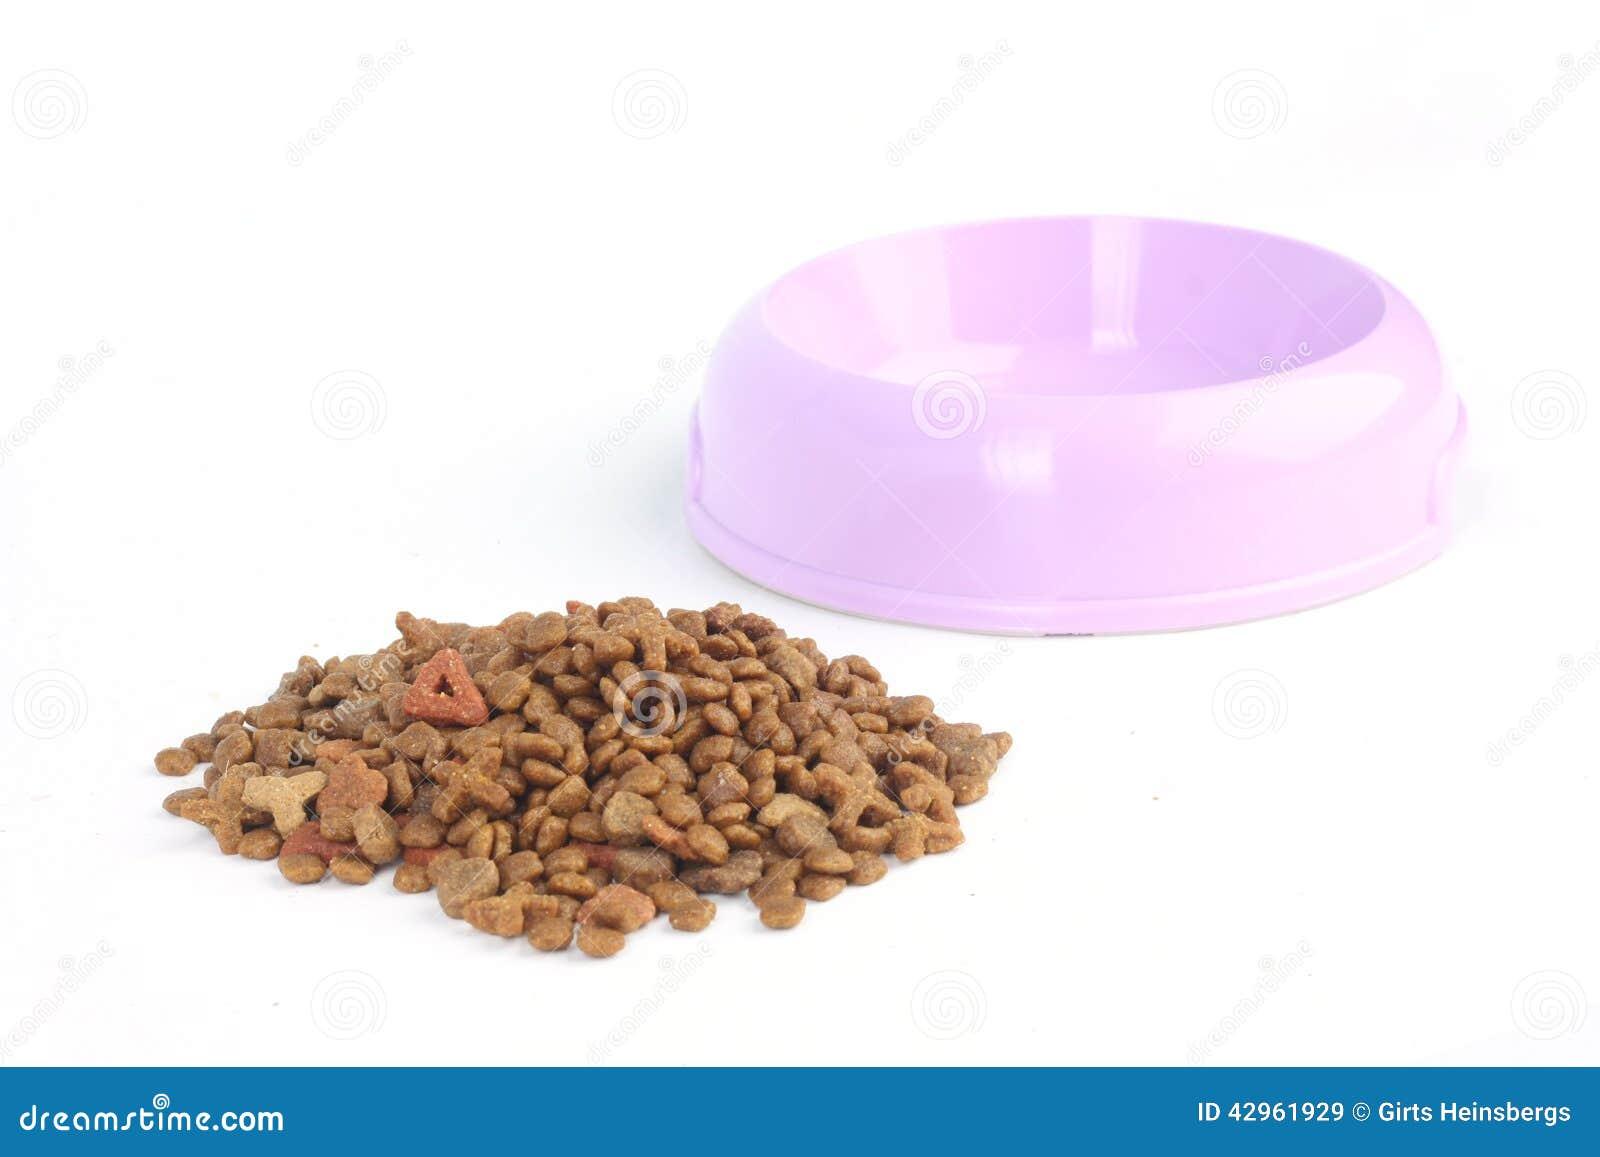 Raw Diet Dry Cat Food